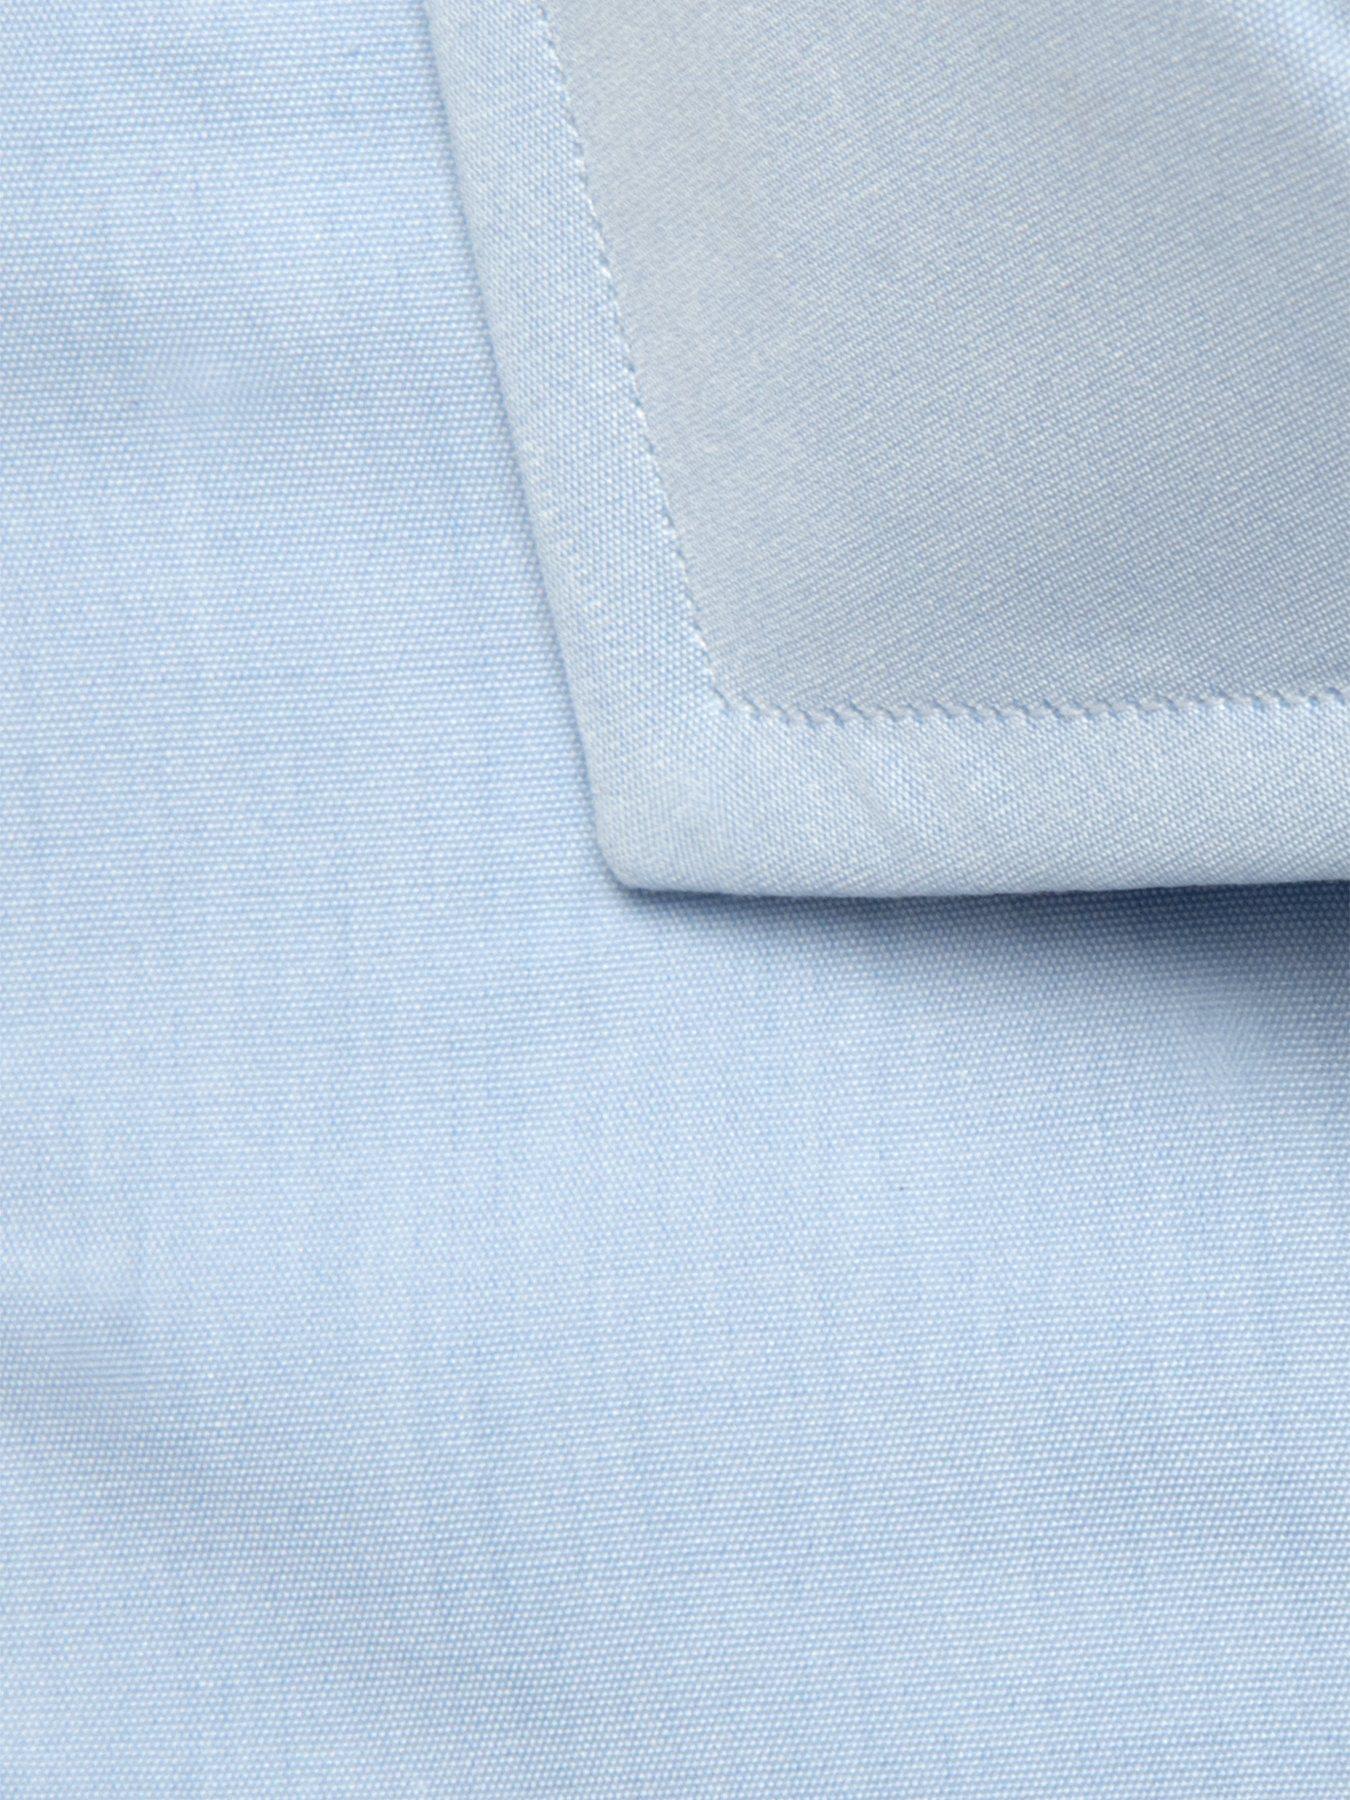 Mens Collars | Cutaway Collar | Extreme Cutaway Collar Shirts